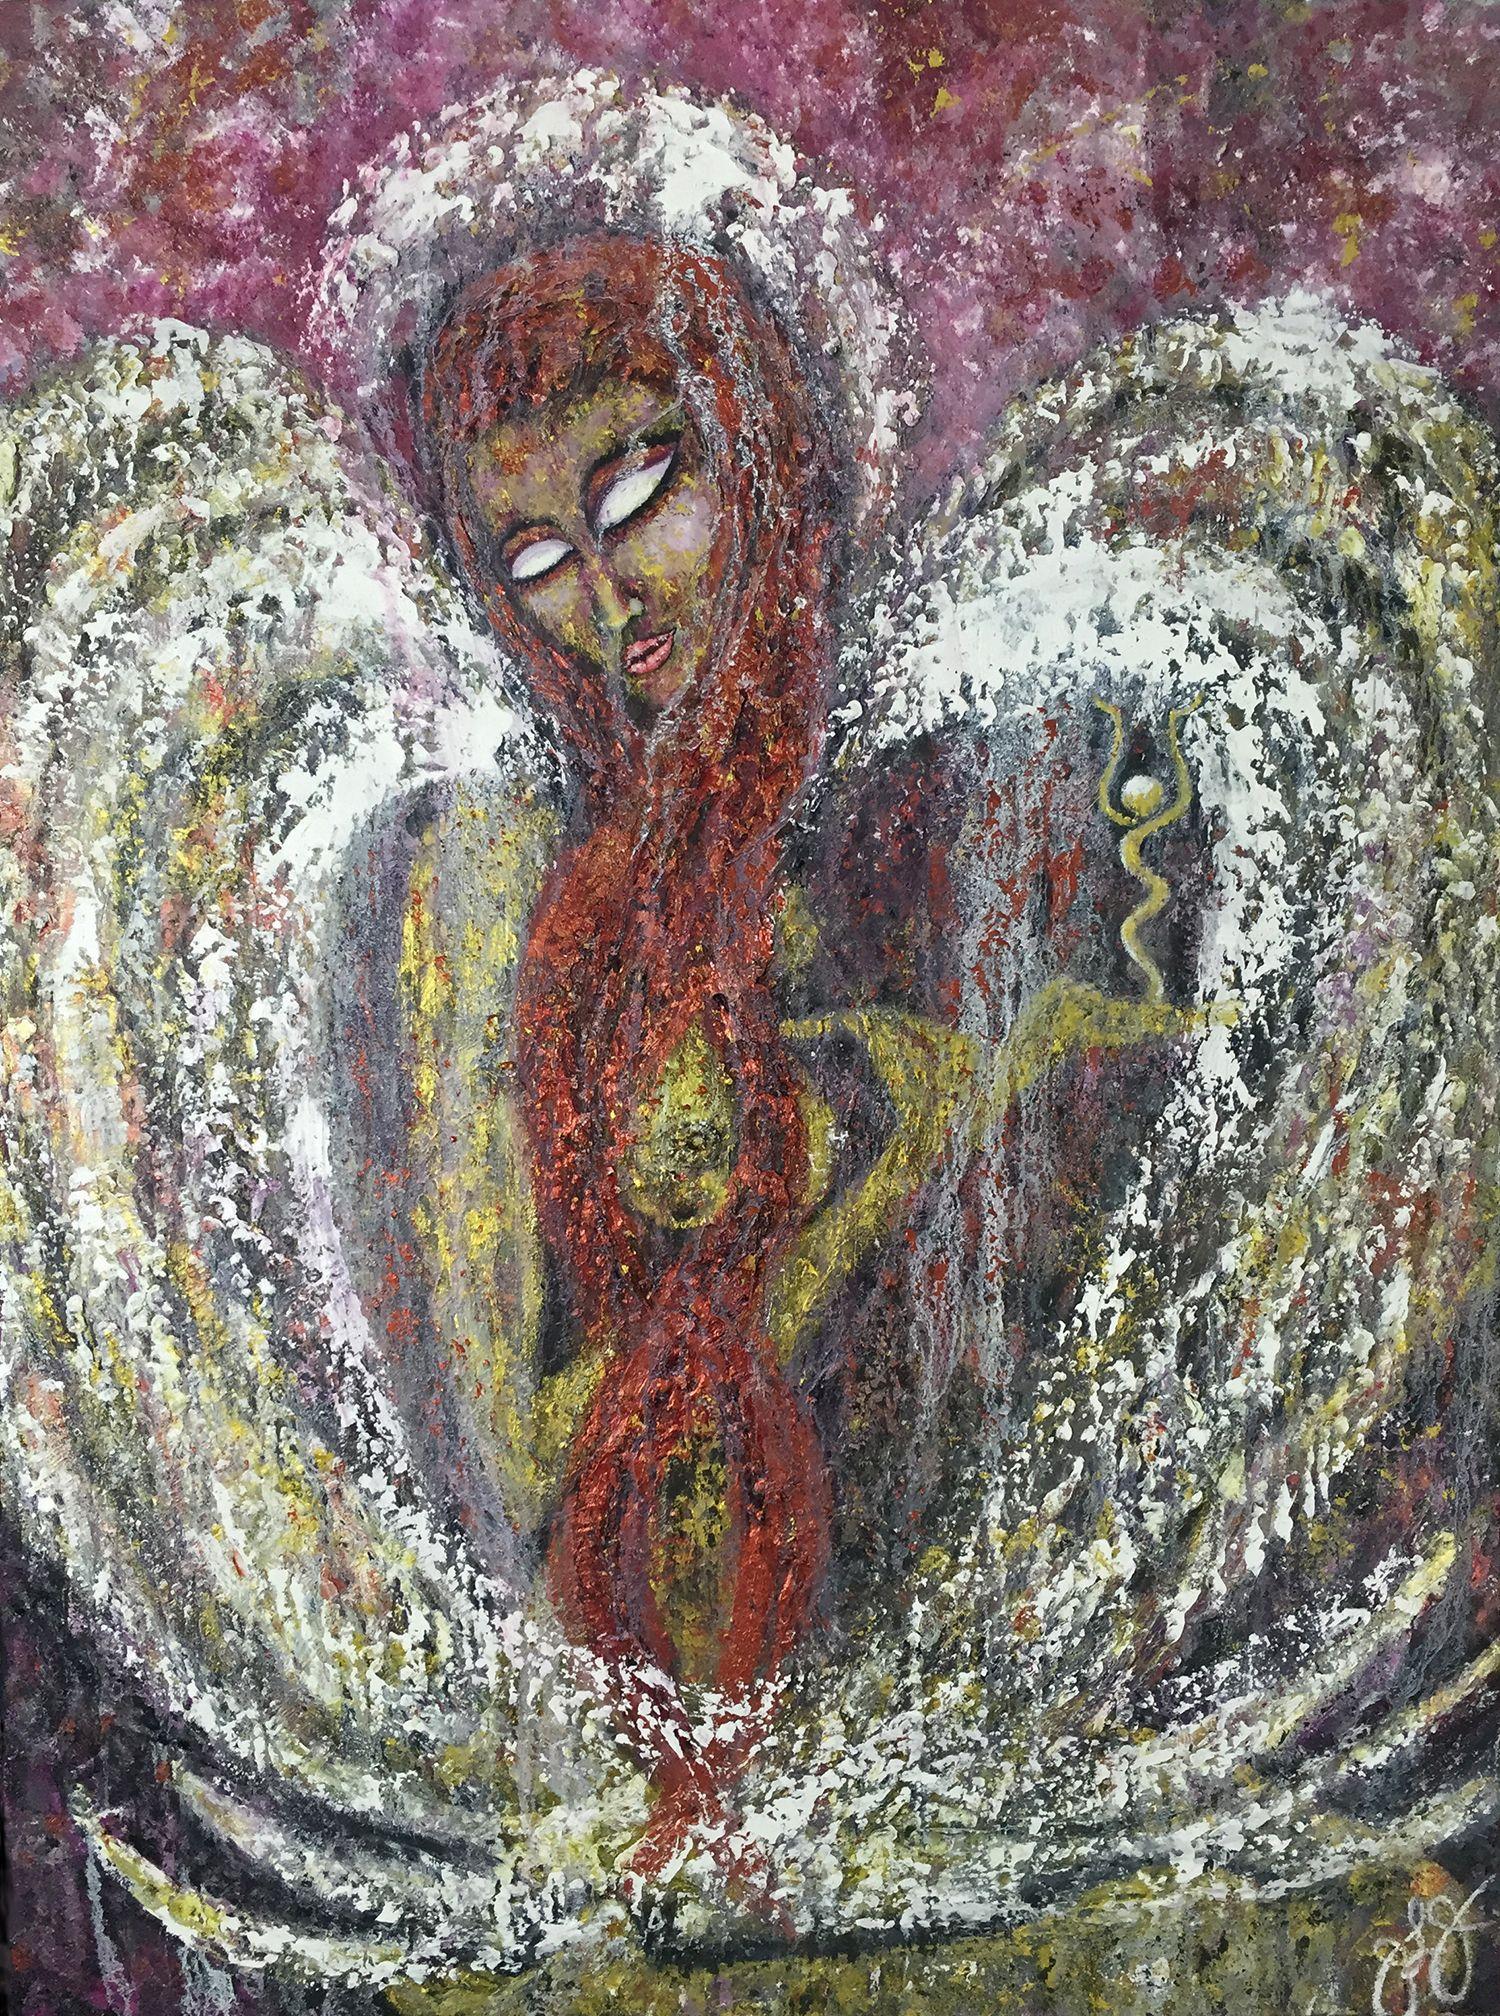 Ariel 5., Mixed Media on Canvas